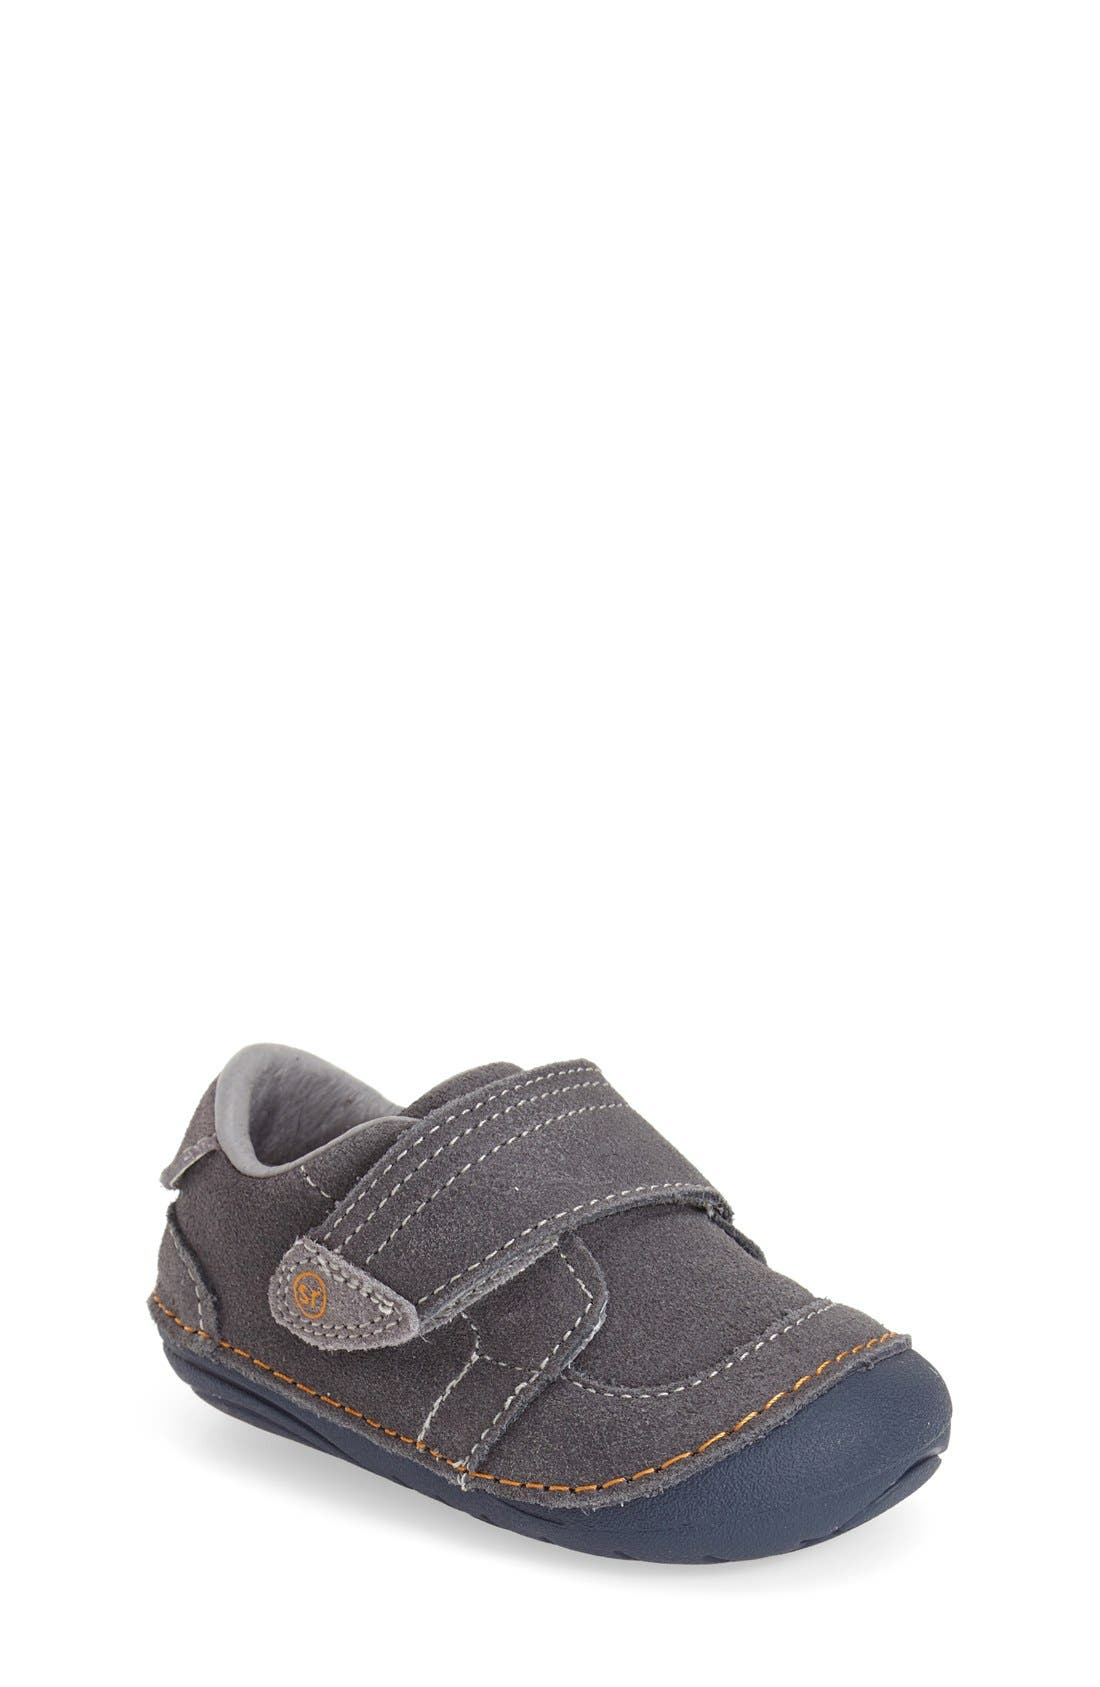 STRIDE RITE Soft Motion Kellen Sneaker, Main, color, GREY